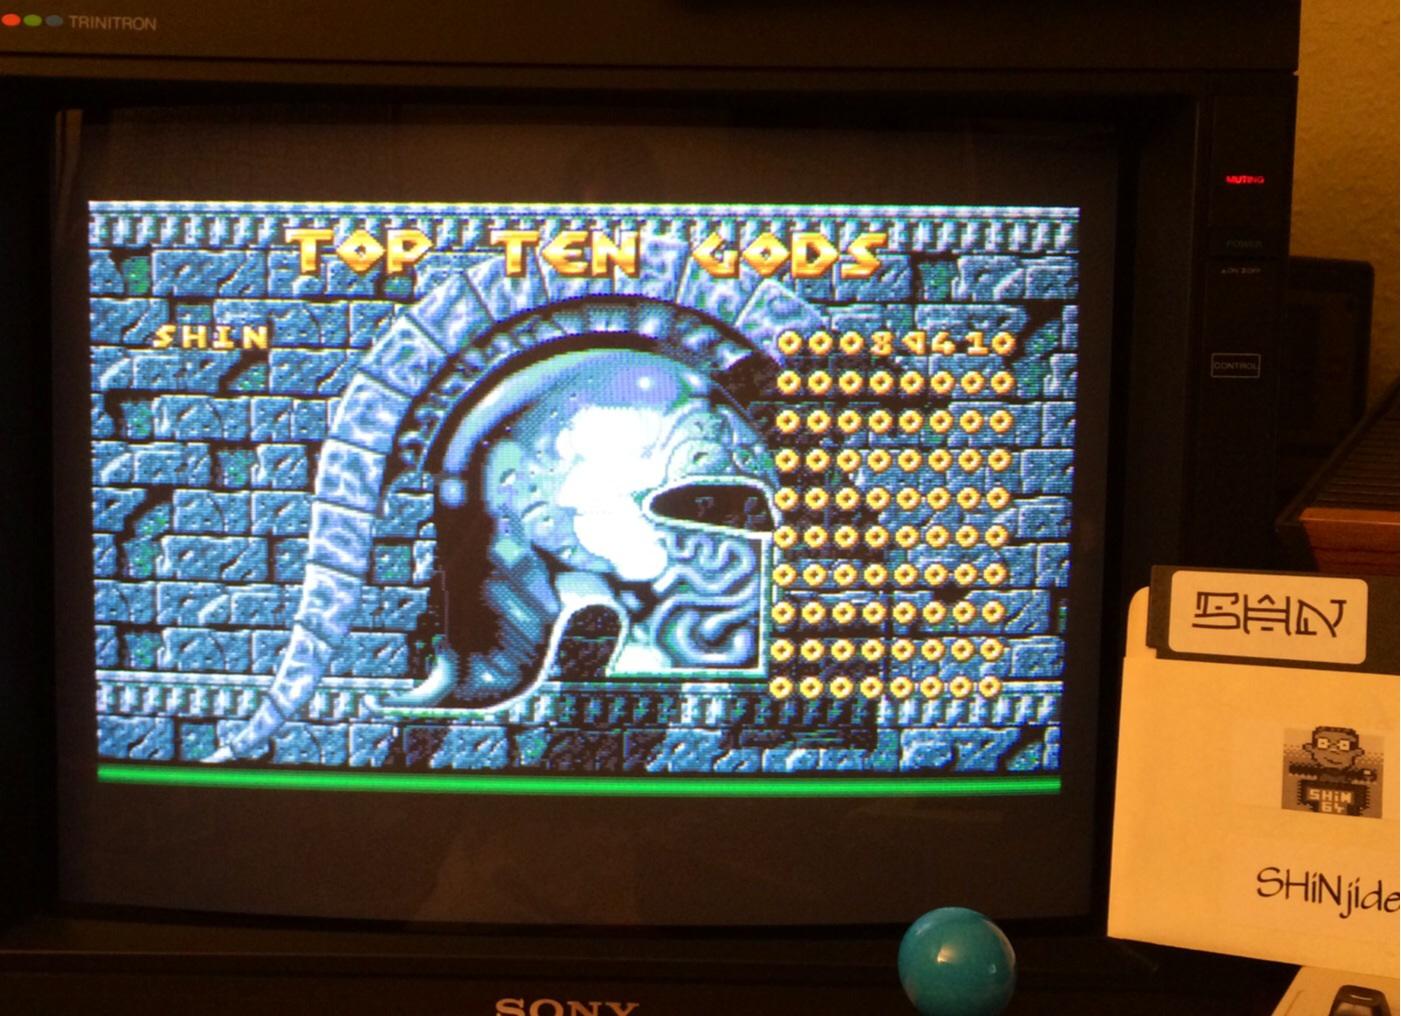 SHiNjide: Gods (Amiga) 89,410 points on 2014-08-23 13:52:52